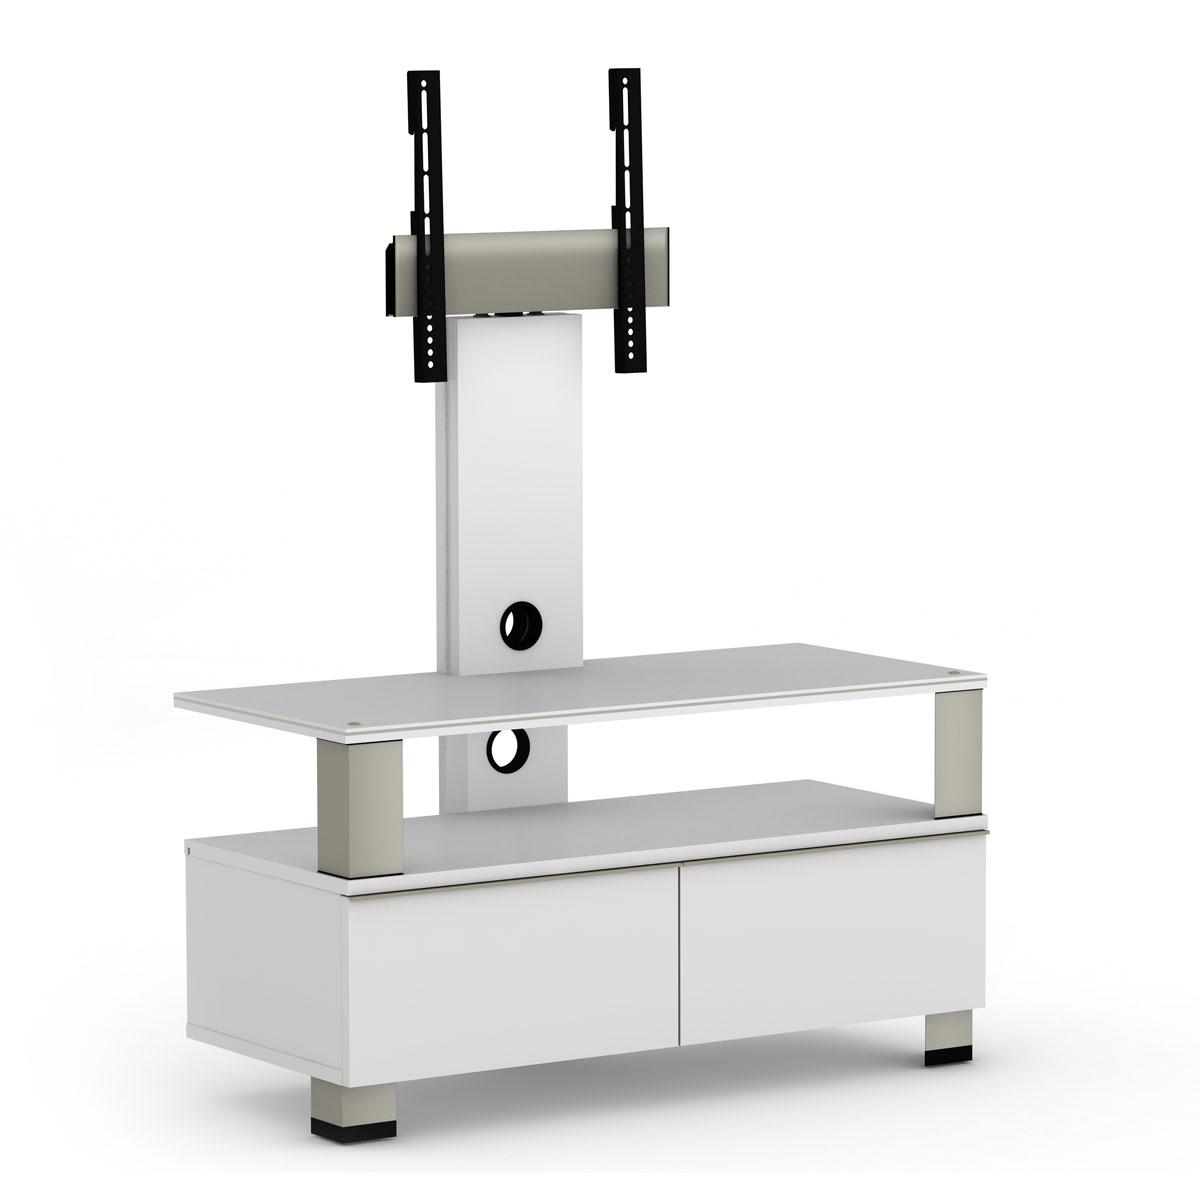 elmob tura tu 095 01f blanc meuble tv elmob sur. Black Bedroom Furniture Sets. Home Design Ideas